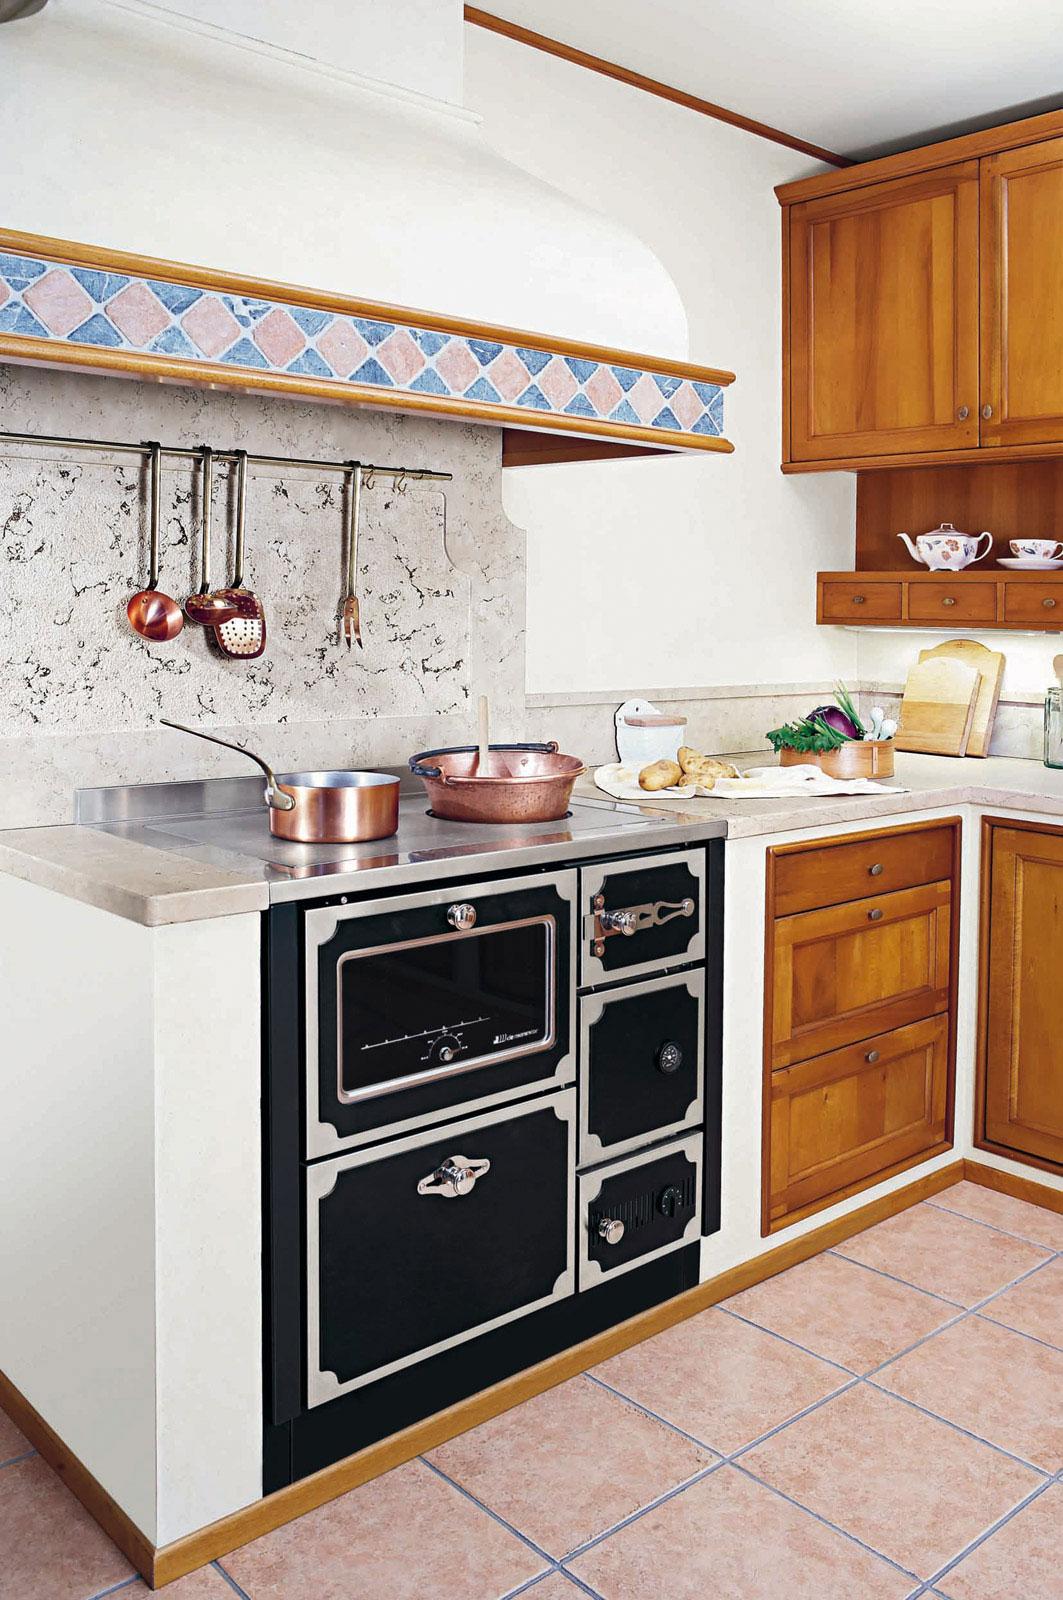 Fk900 demanincor s p a - Configura cucina ...